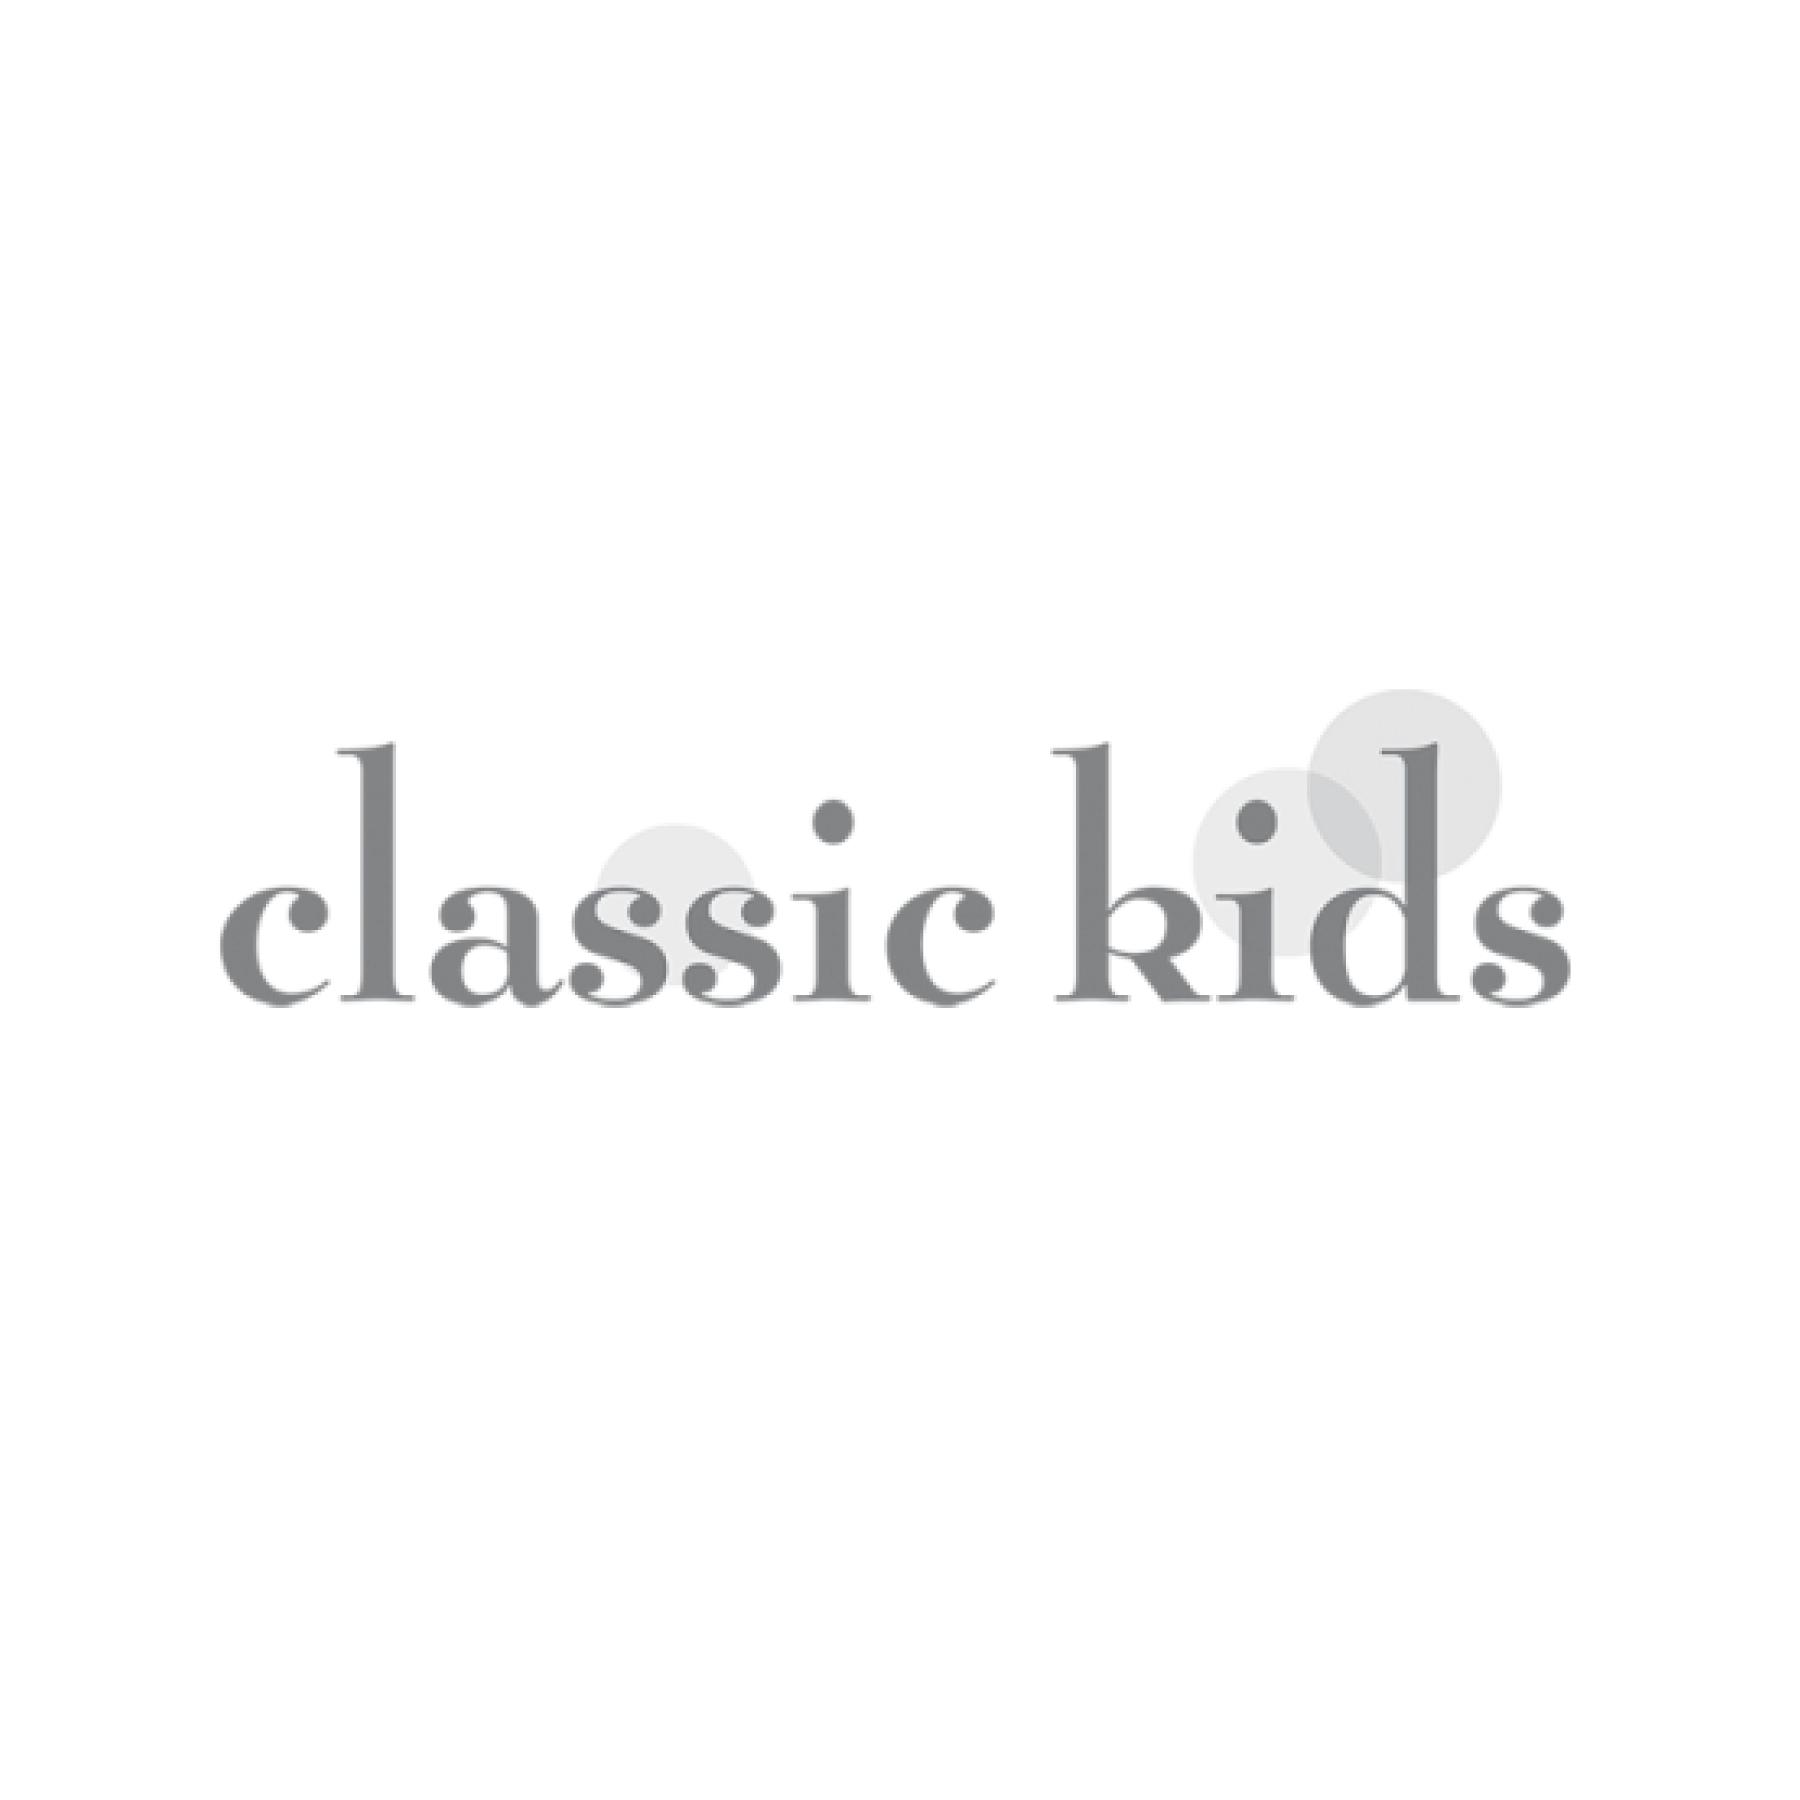 Classic Kids logo